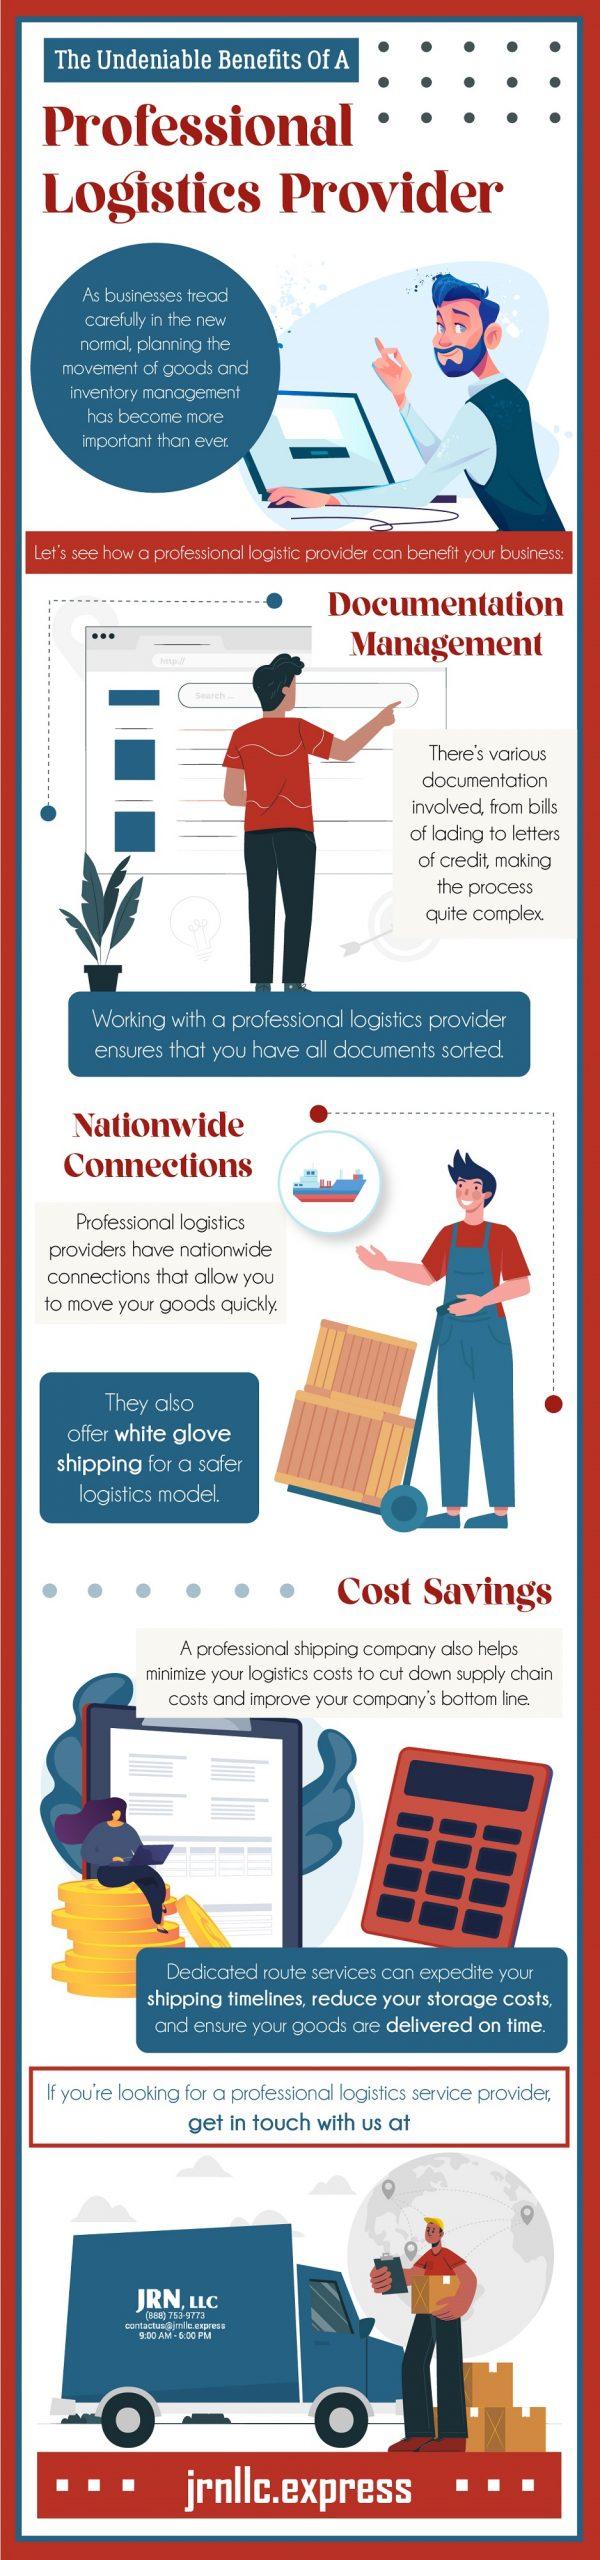 benefits of professional logistics provider